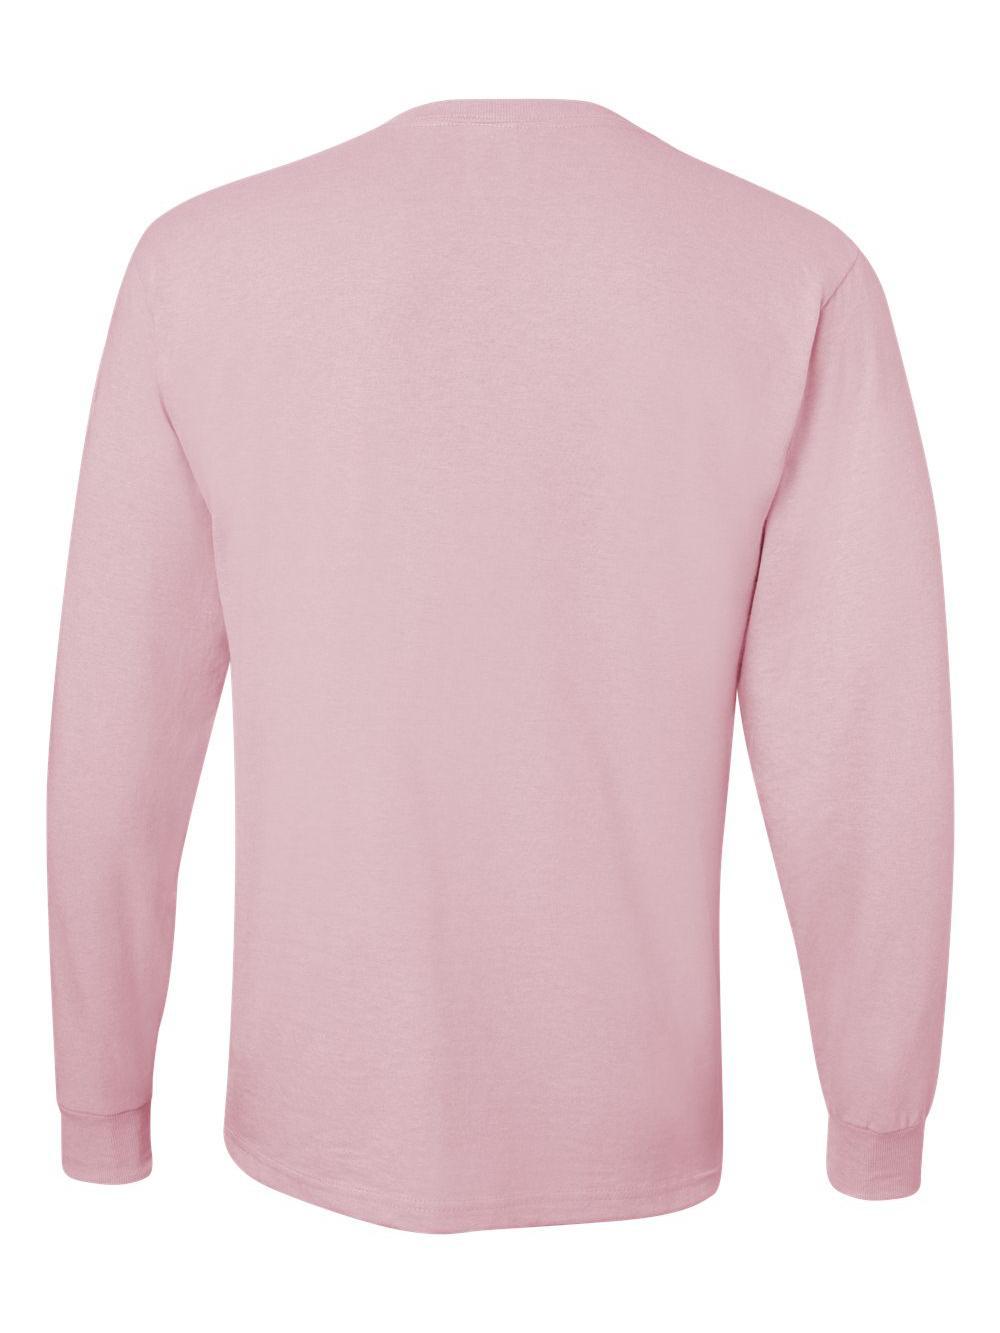 Jerzees-Dri-Power-Long-Sleeve-50-50-T-Shirt-29LSR thumbnail 28